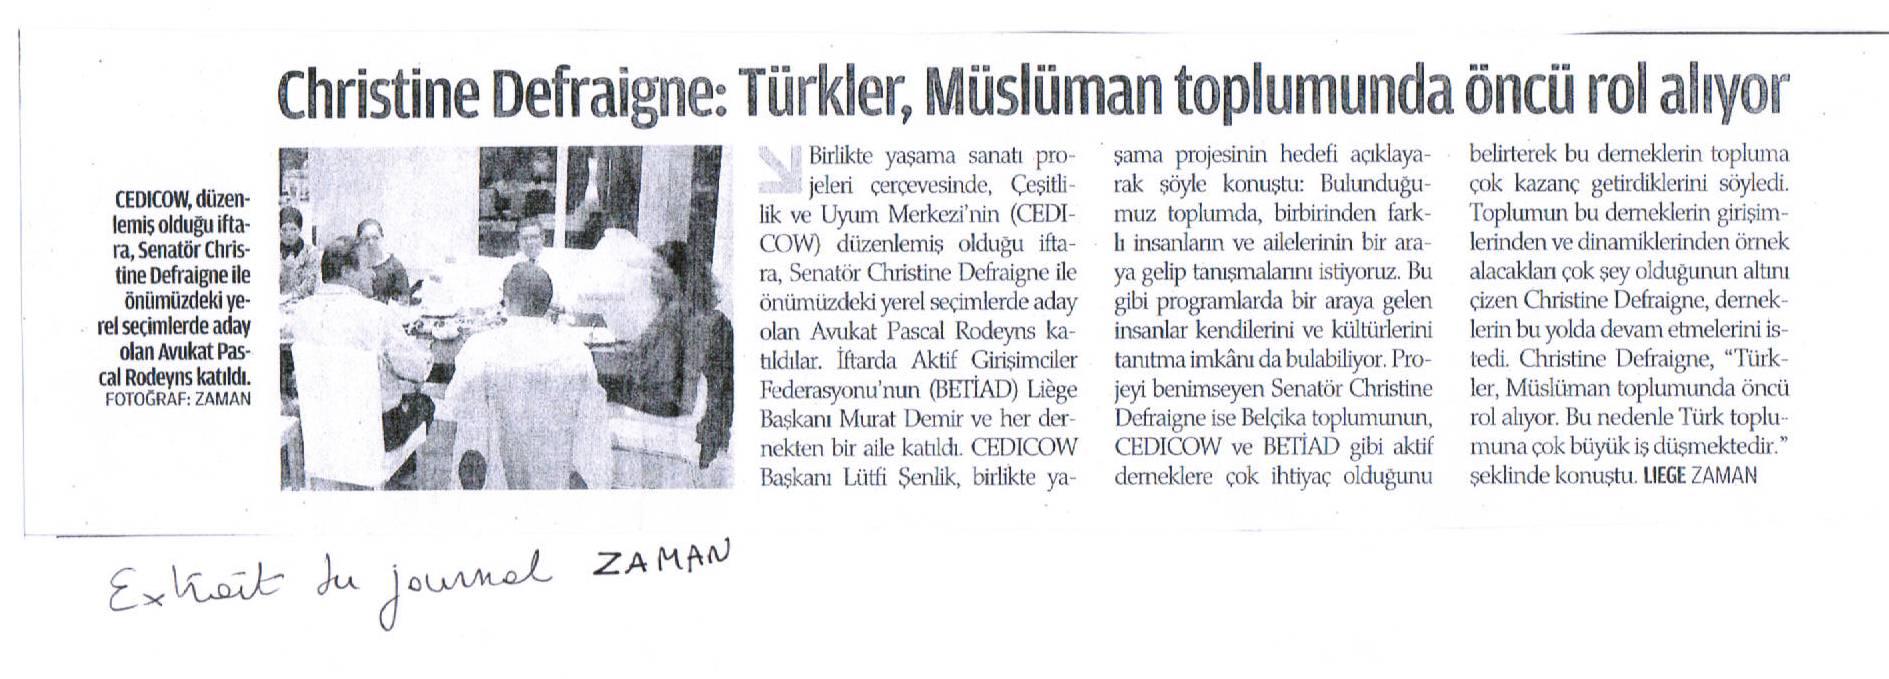 rencontre belgique turquie